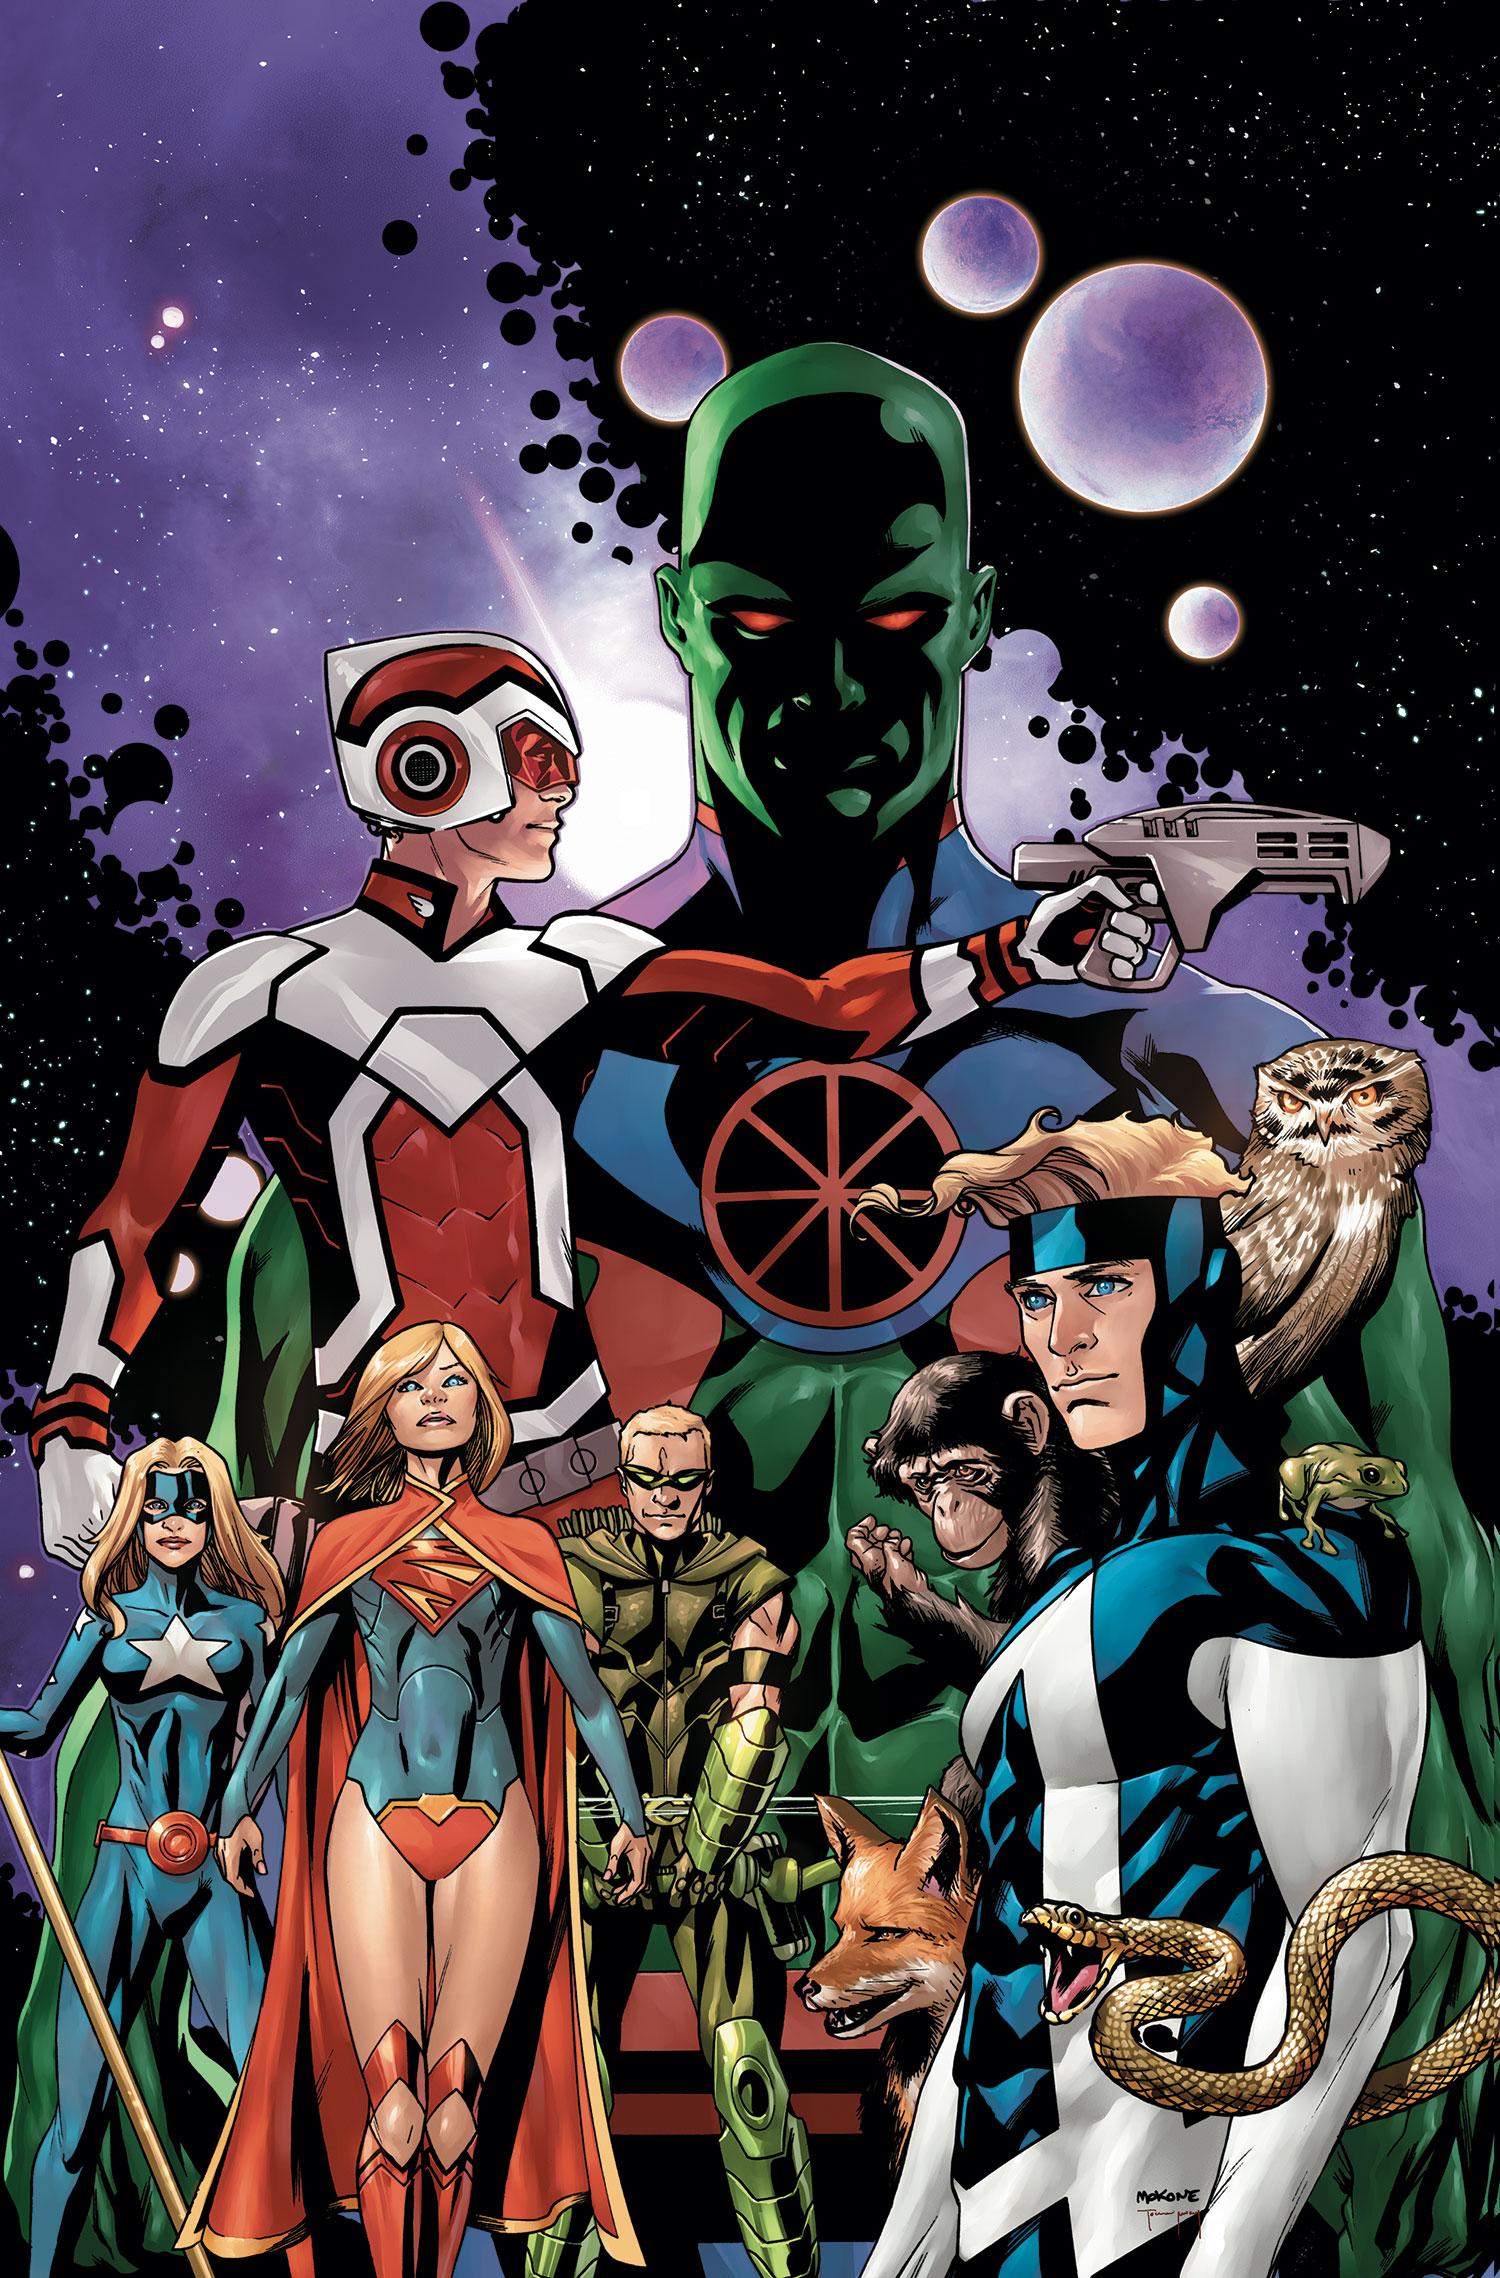 Justice League United Vol 1 0 Solicit.jpg